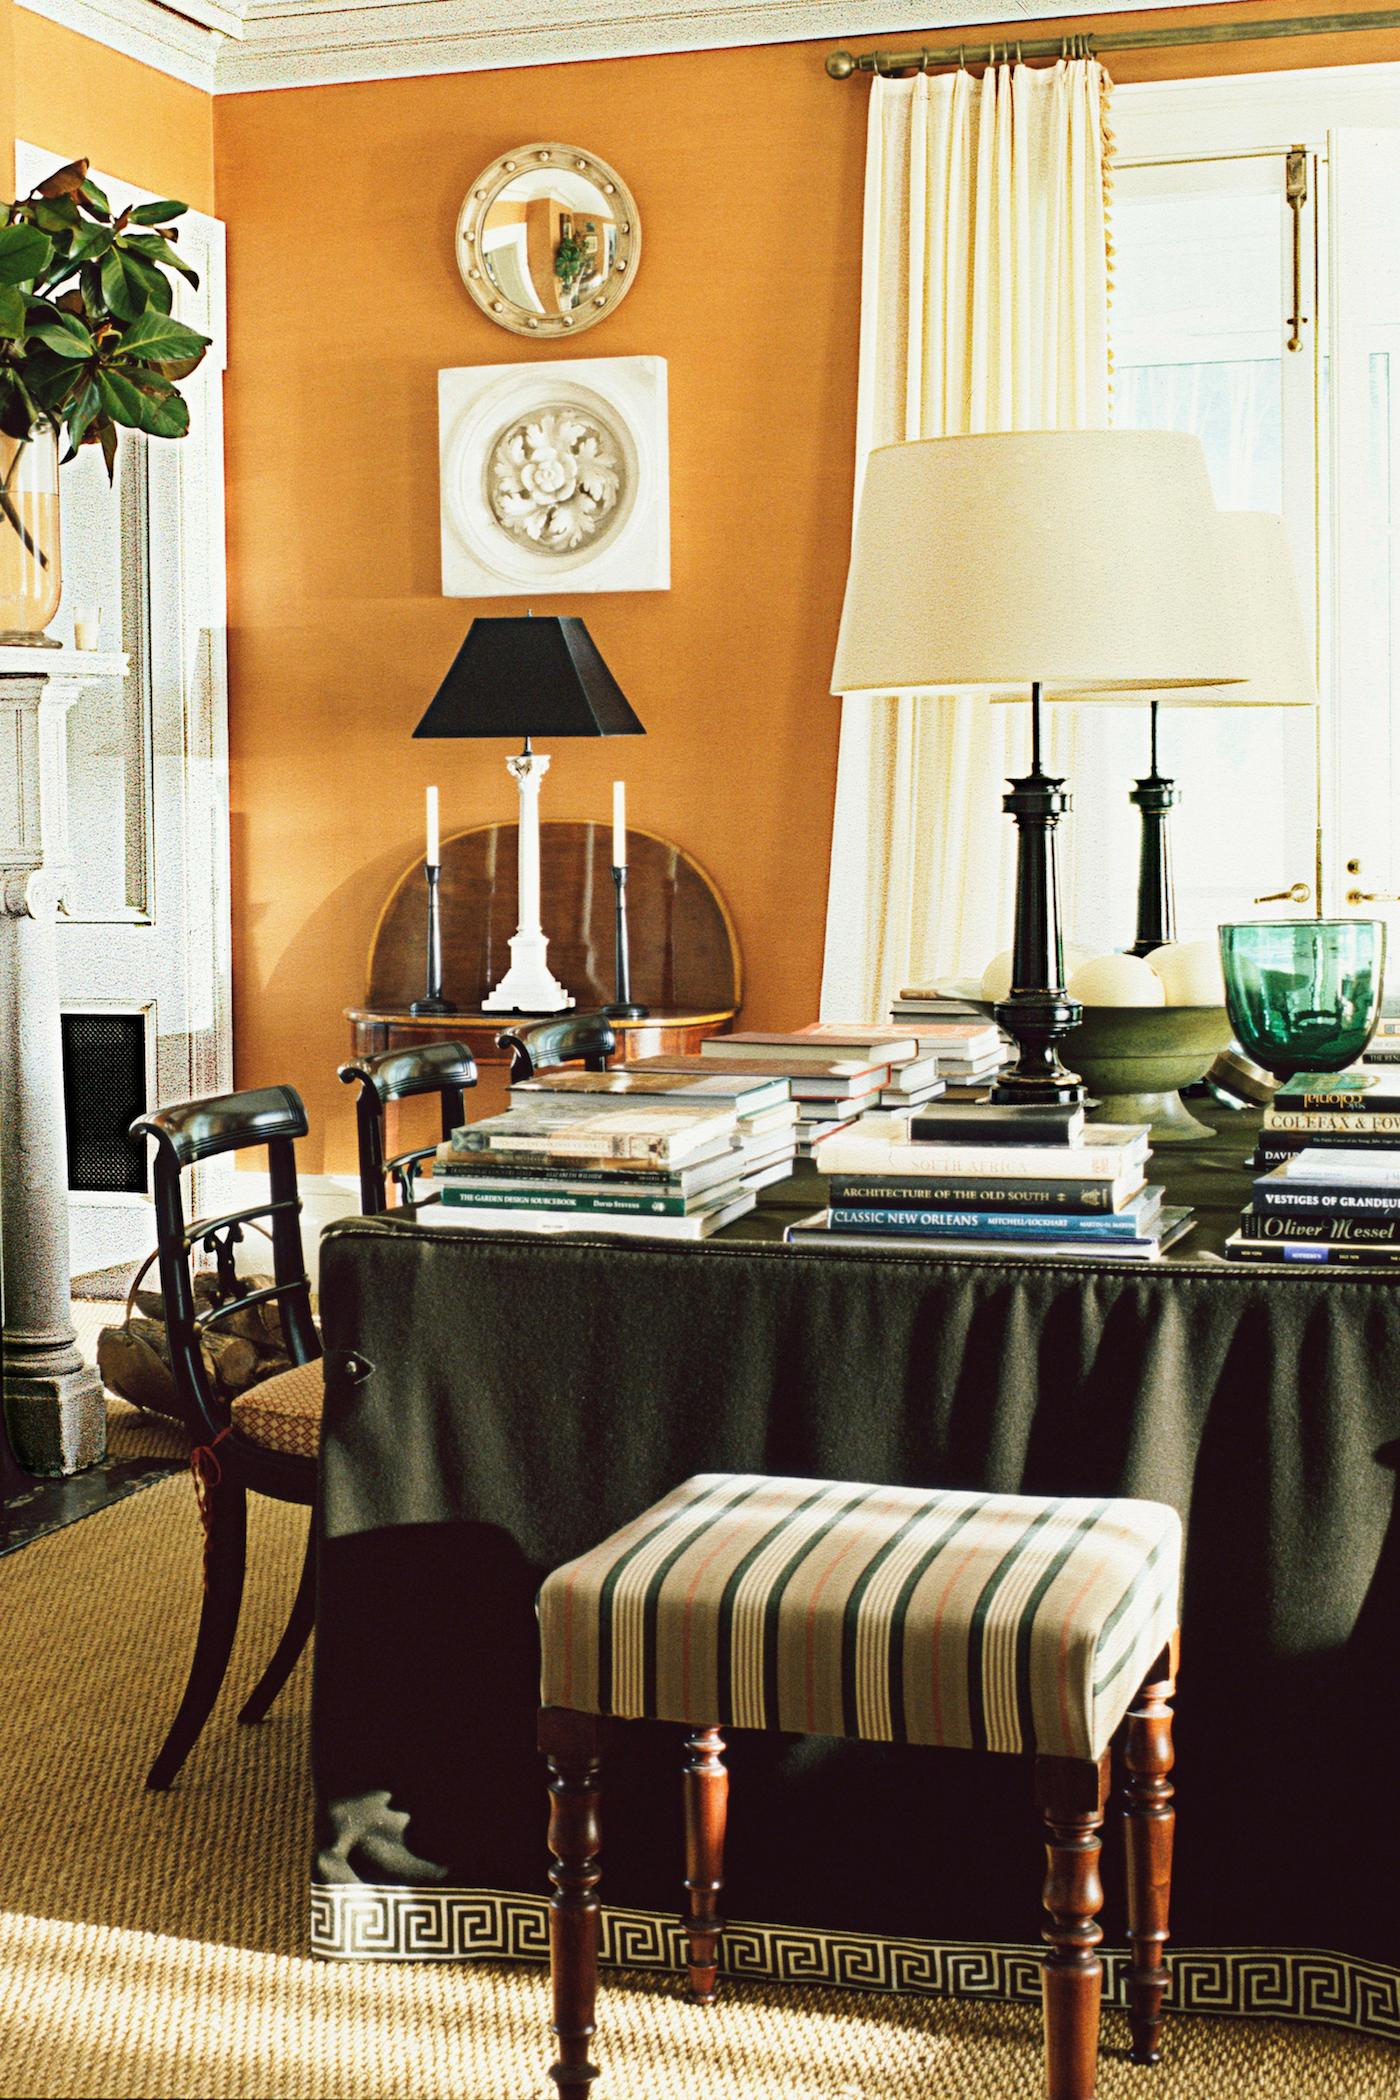 Professional Room Designer: Professional Decorating Tips